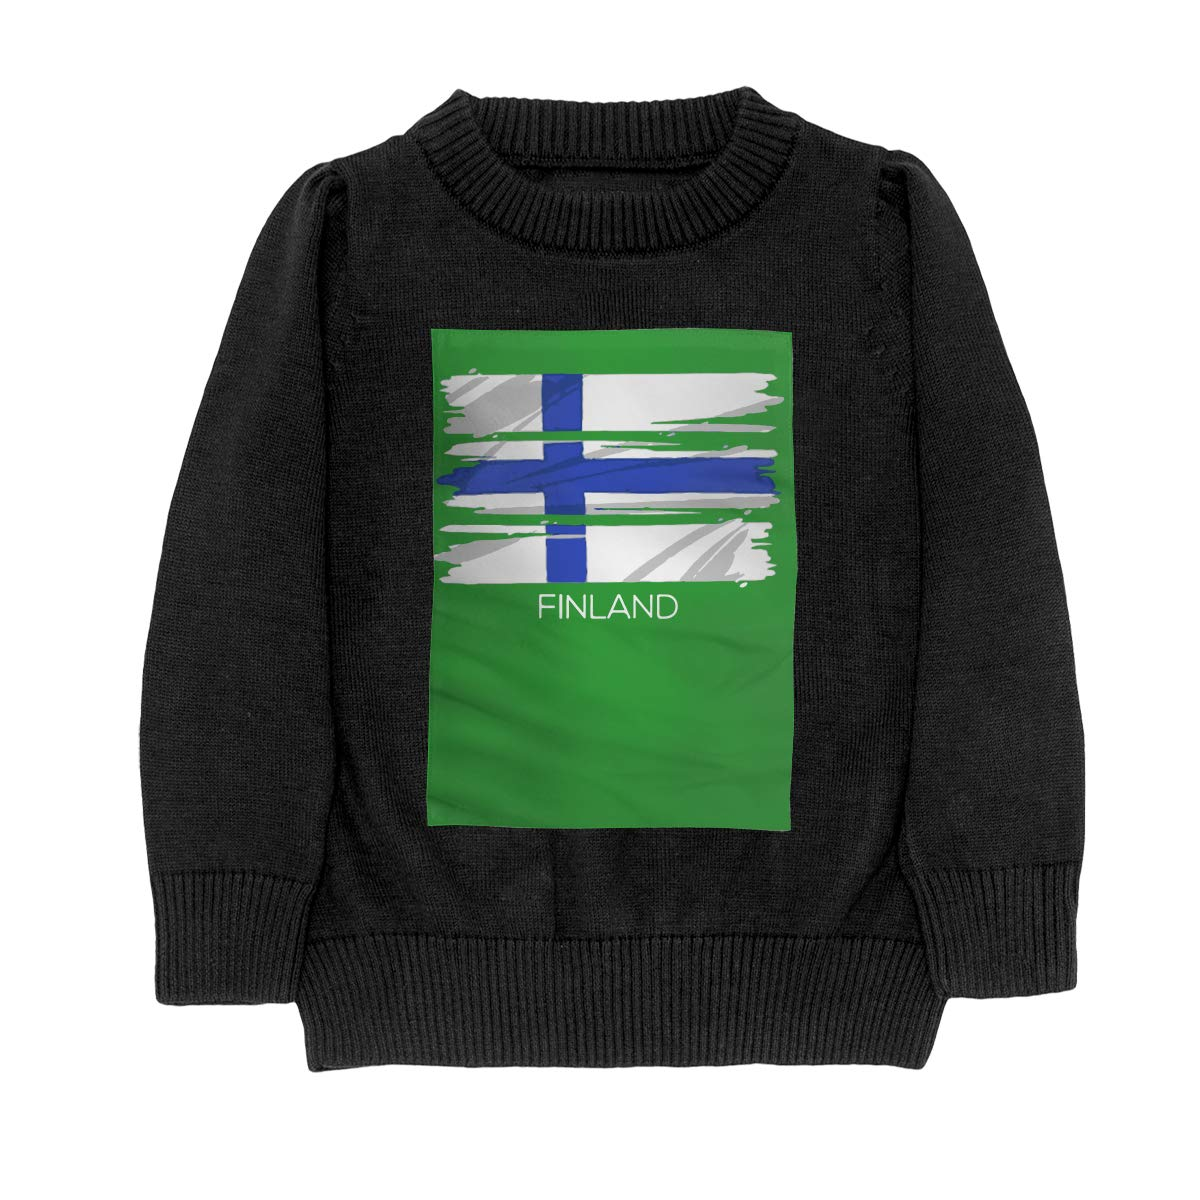 WWTBBJ-B Finnish Proud Patriotic Flag Style Adolescent Boys Girls Unisex Sweater Keep Warm